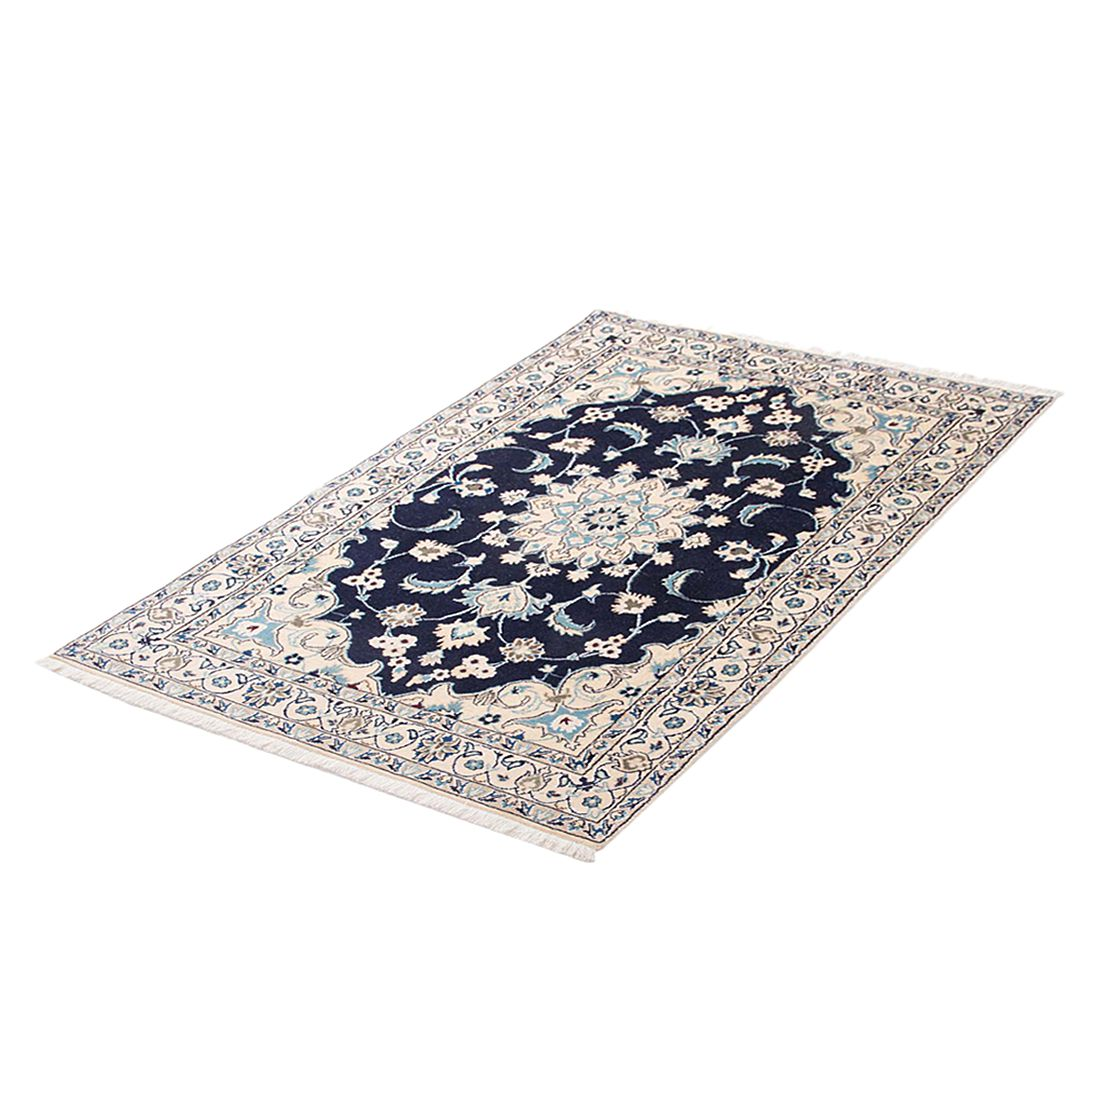 Teppich Khorasan Nain - Schwarz - 200 x 300 cm, Parwis